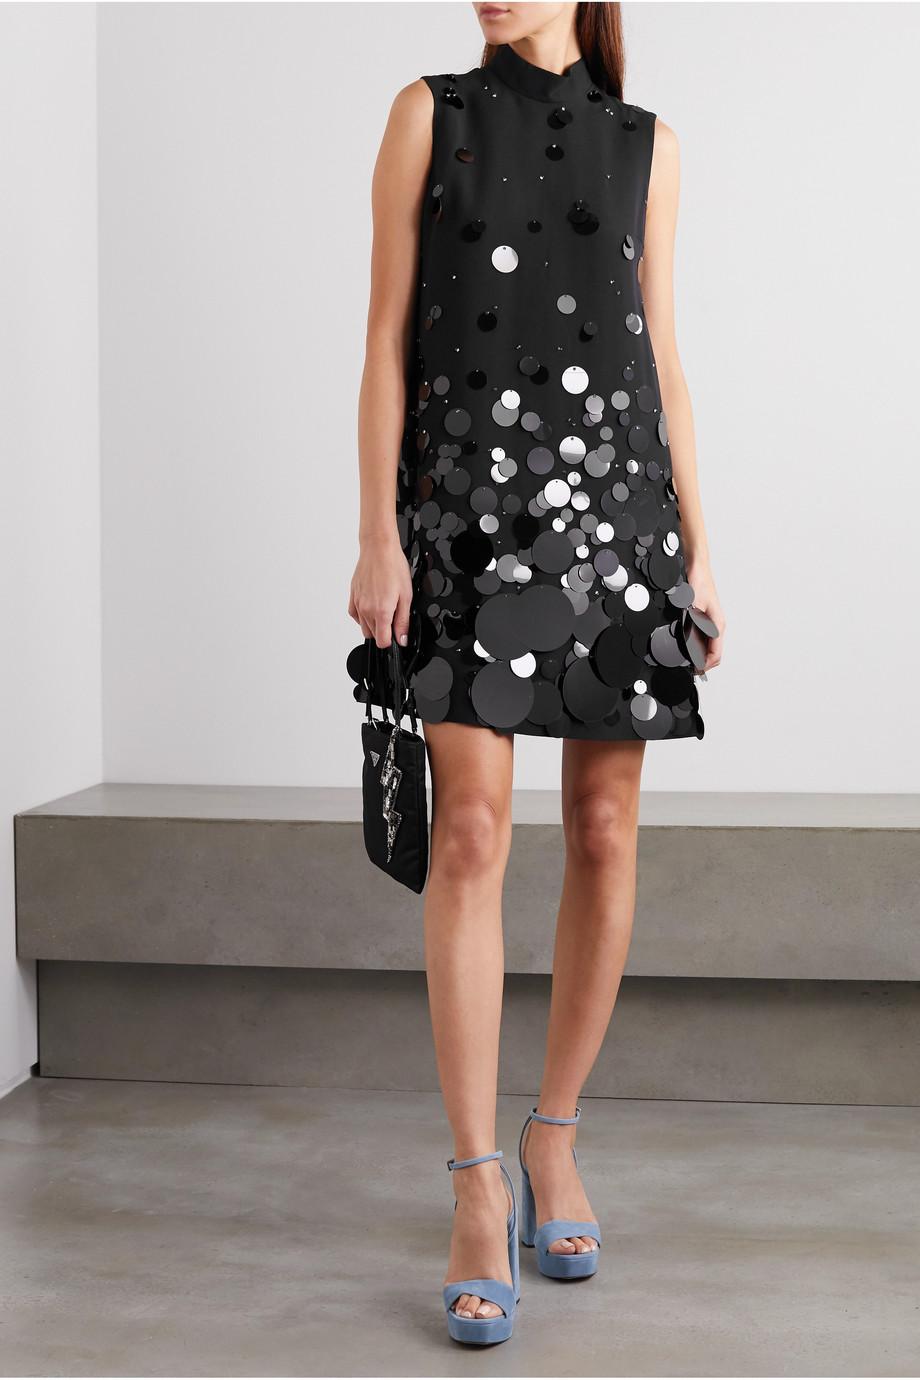 Prada Mini-robe en cady à paillettes